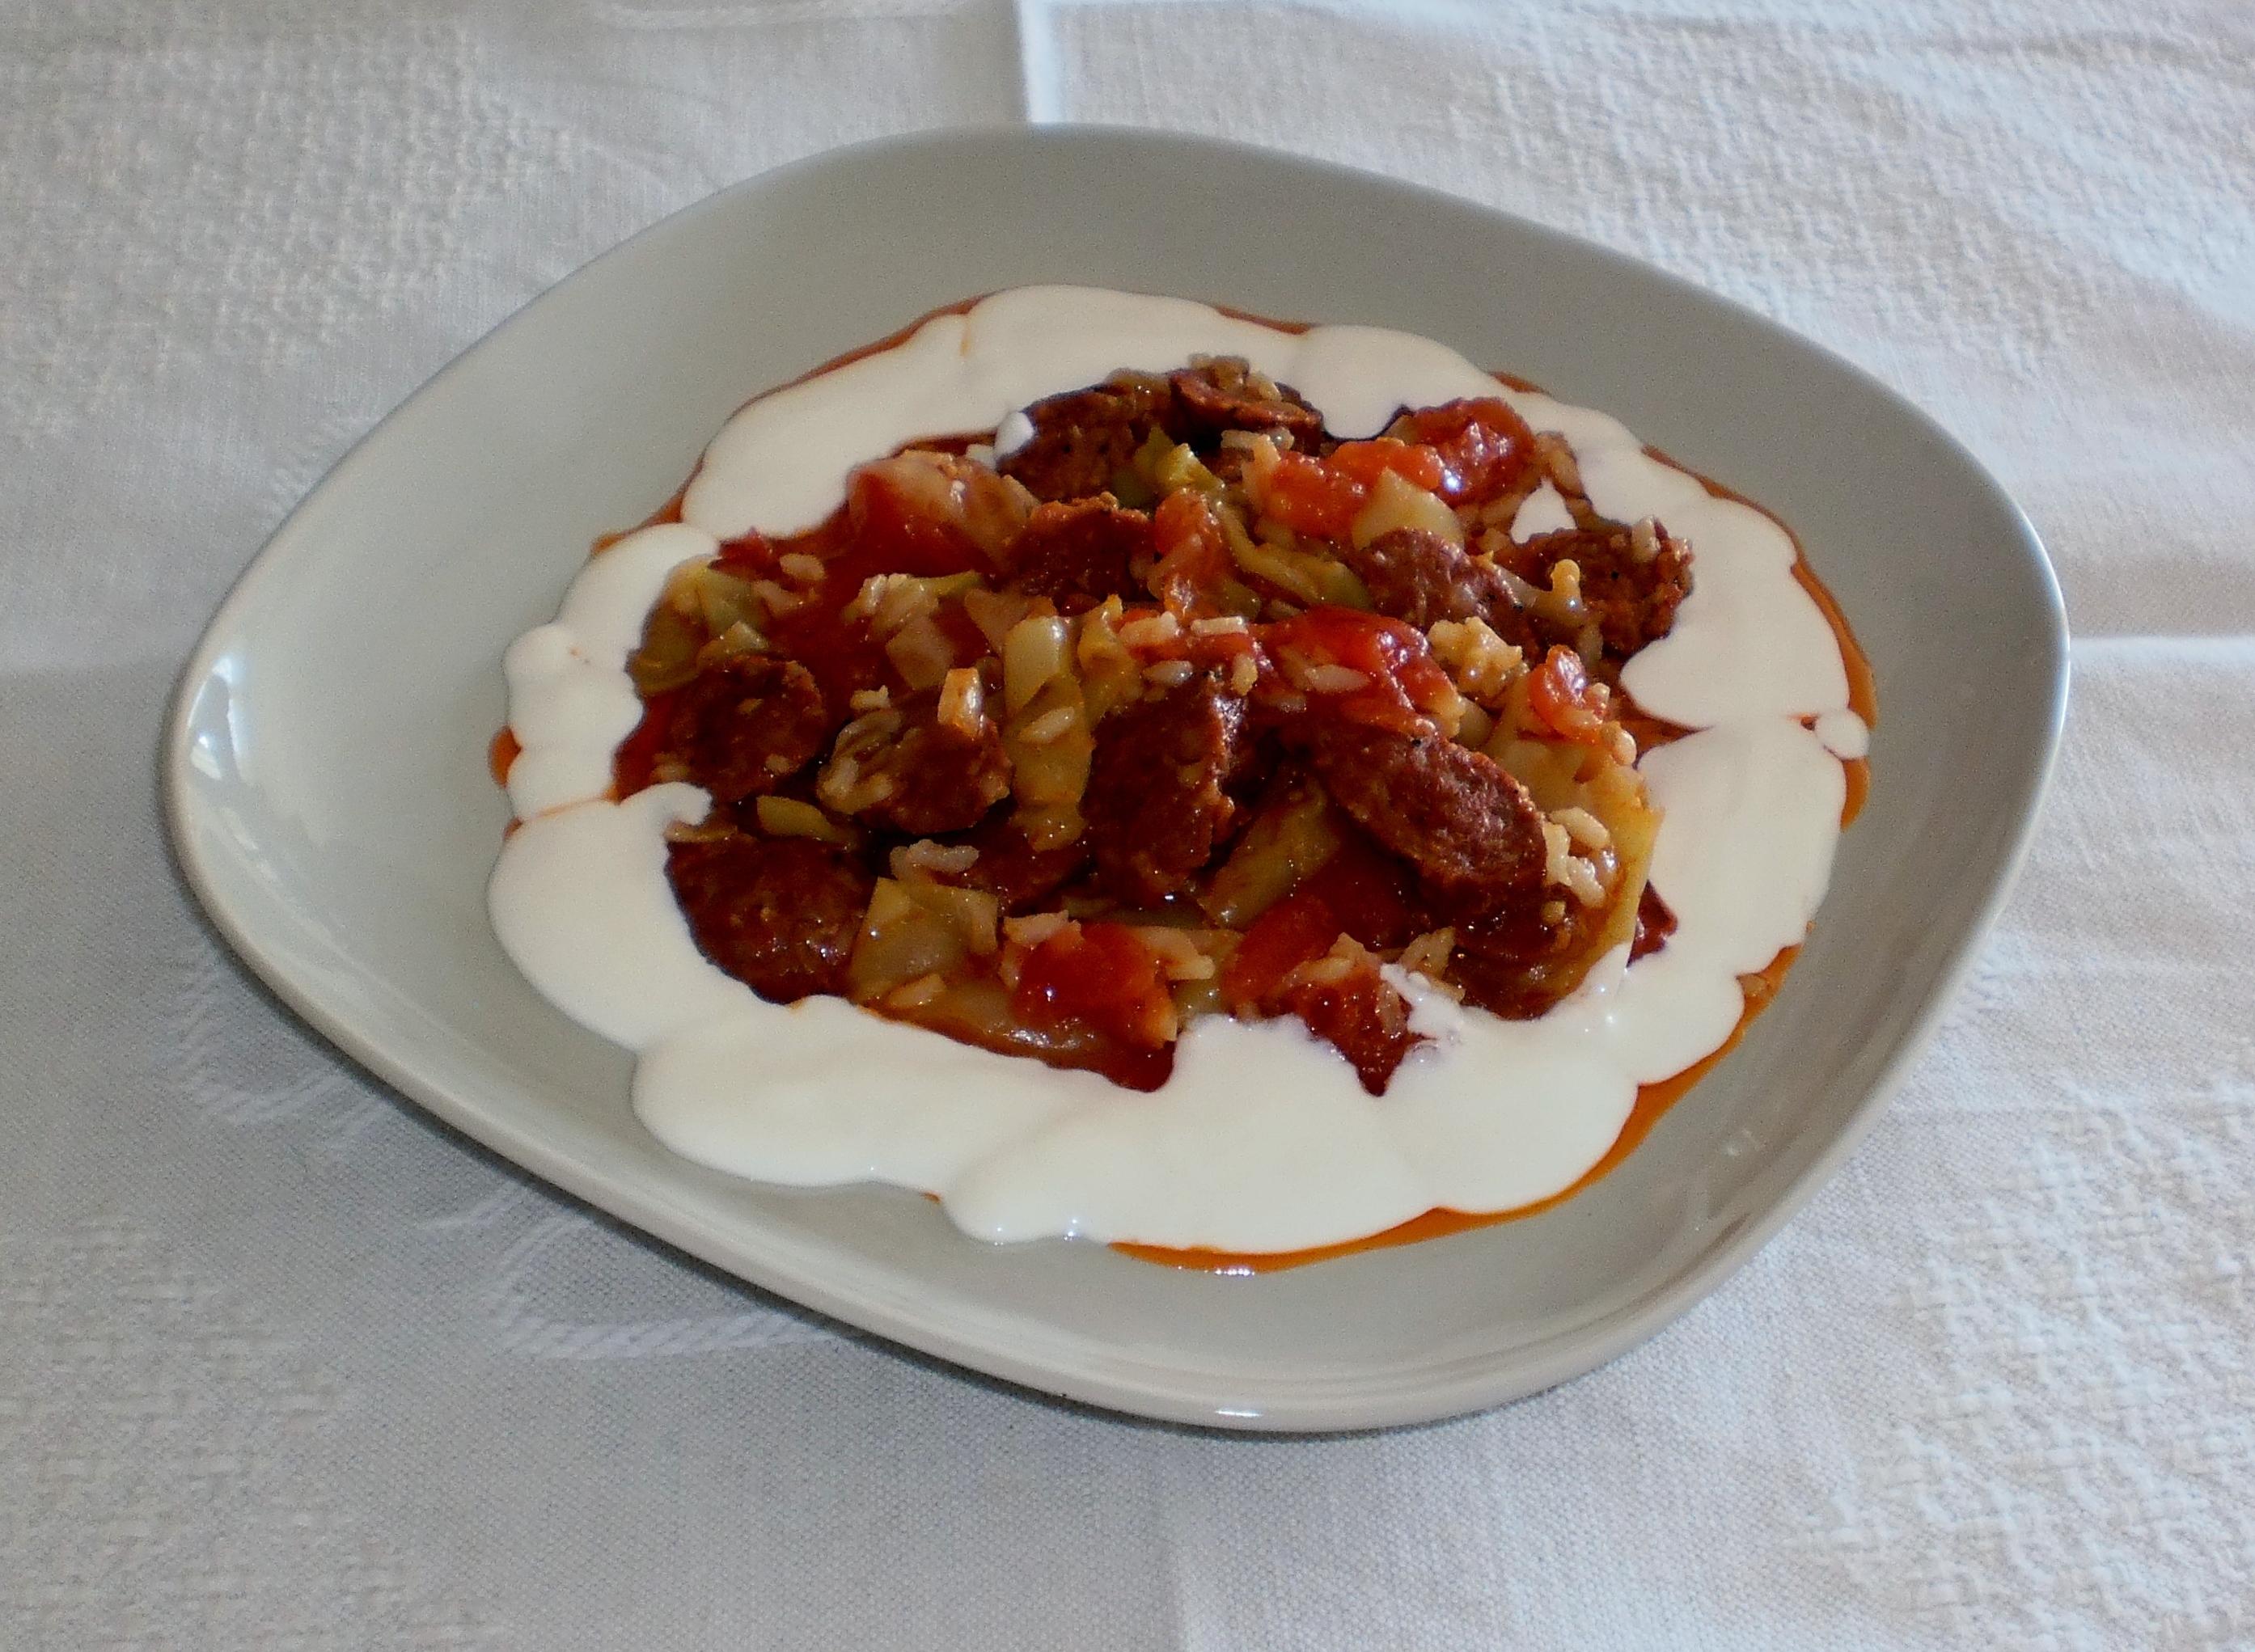 Ungersk grönsaks- och korvgryta - Lecsó